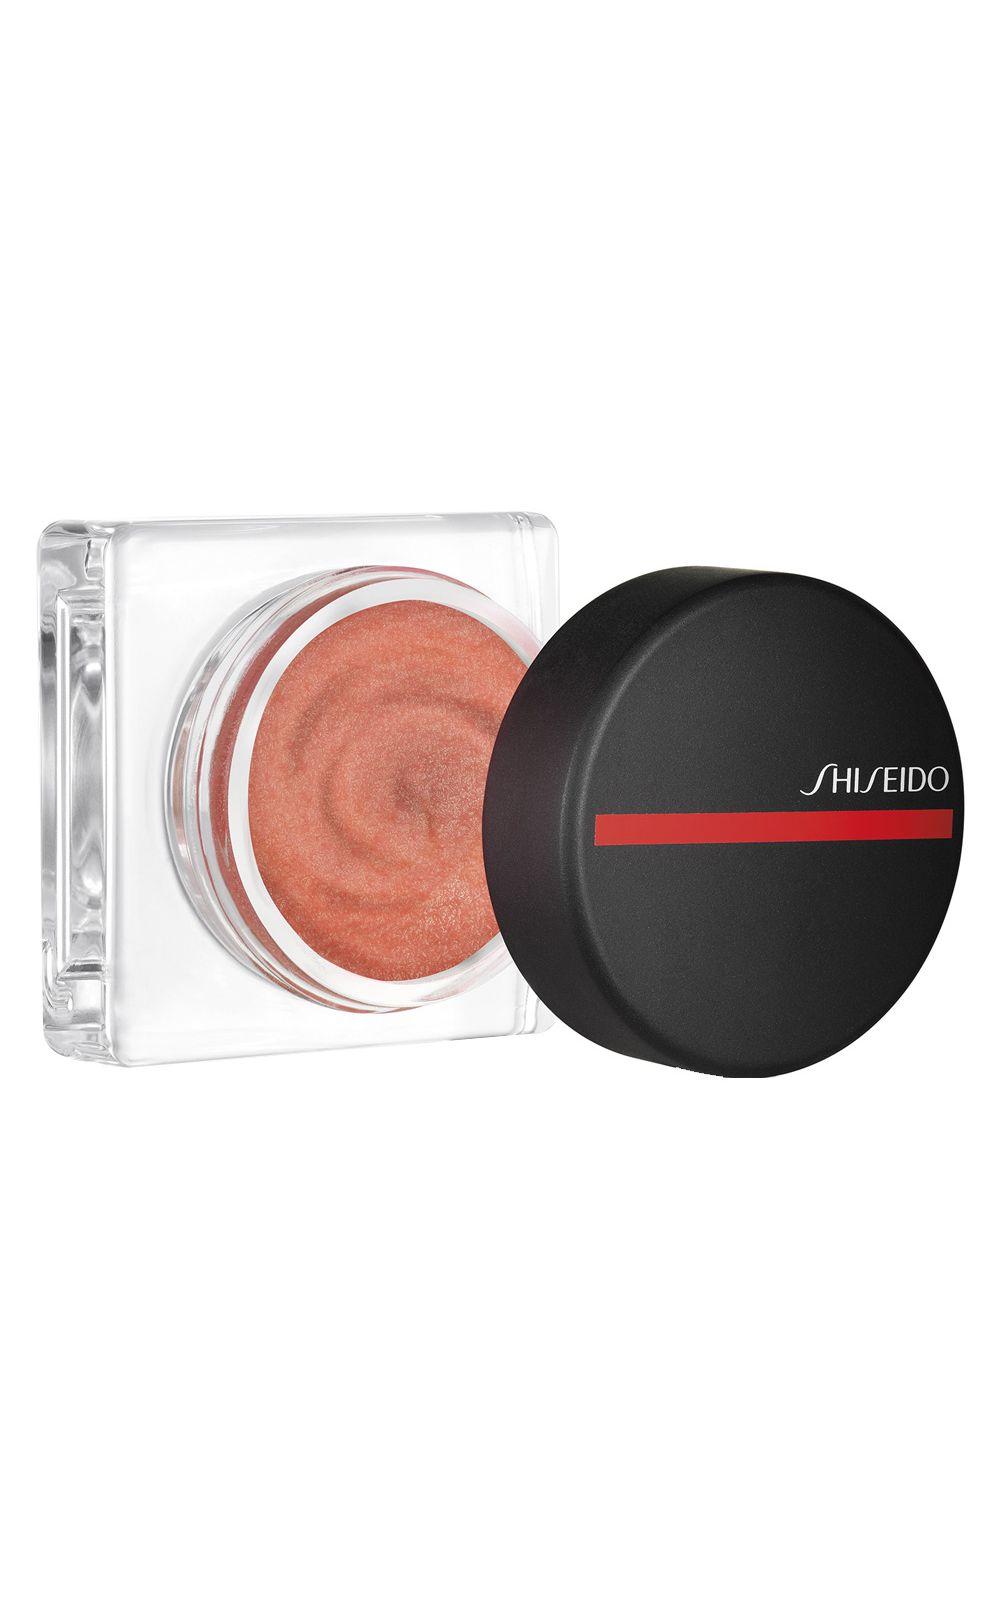 Foto 1 - Blush em Mousse Shiseido - Minimalist WhippedPowder - 03 Momoko